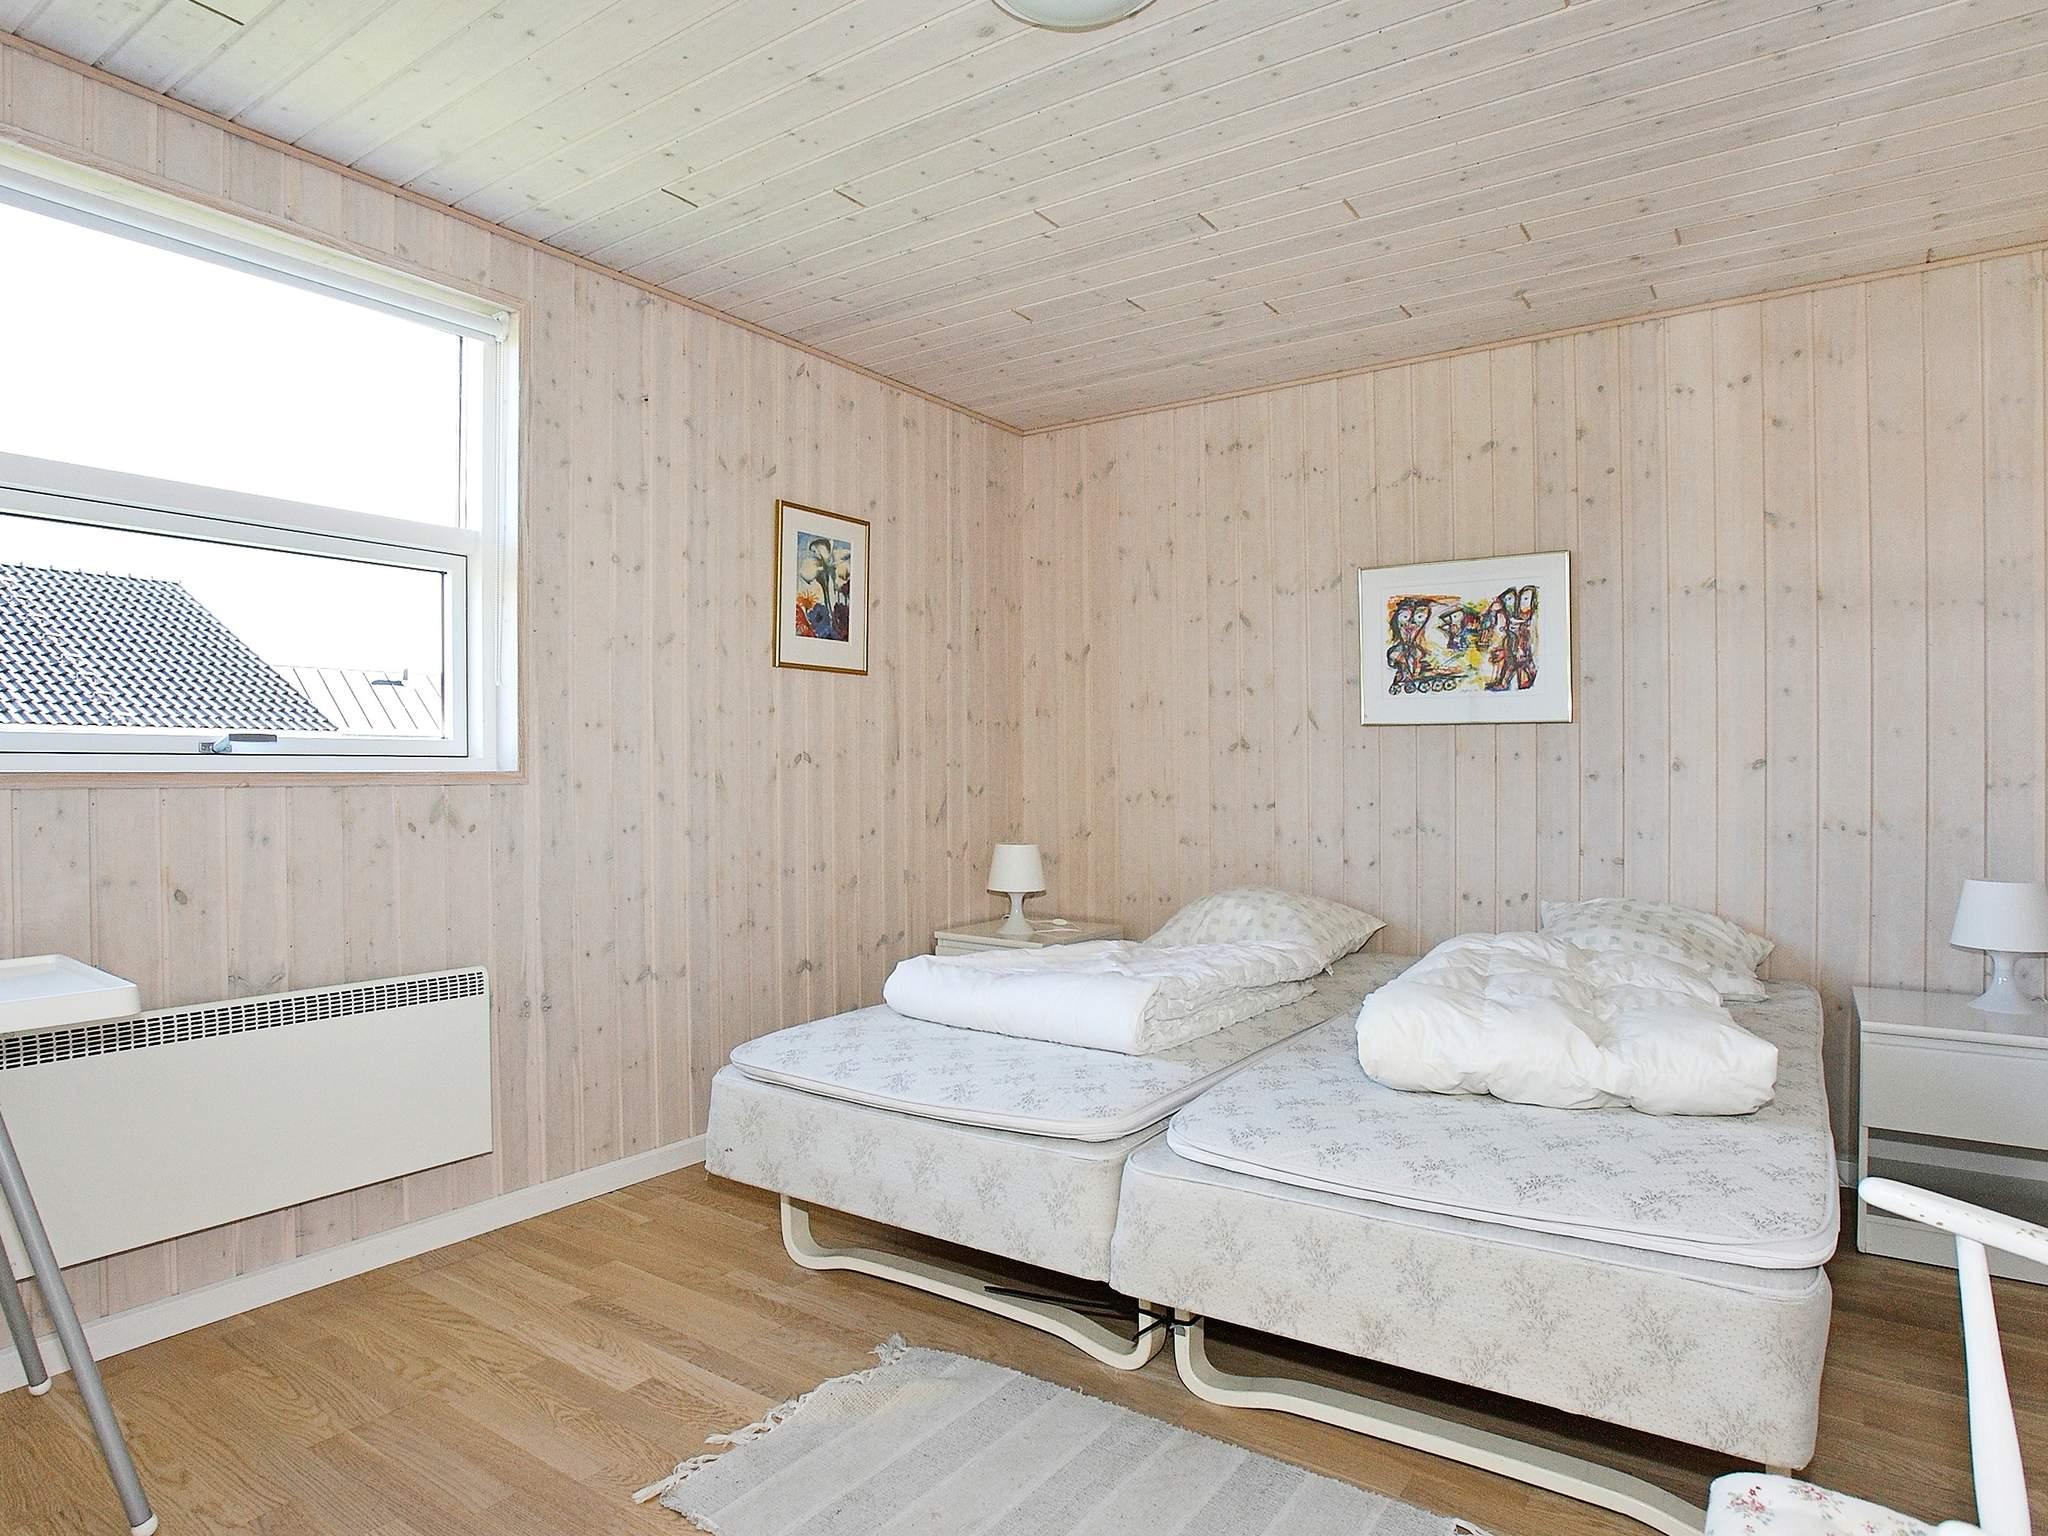 Ferienhaus Øster Hurup (318785), Øster Hurup, , Dänische Ostsee, Dänemark, Bild 7